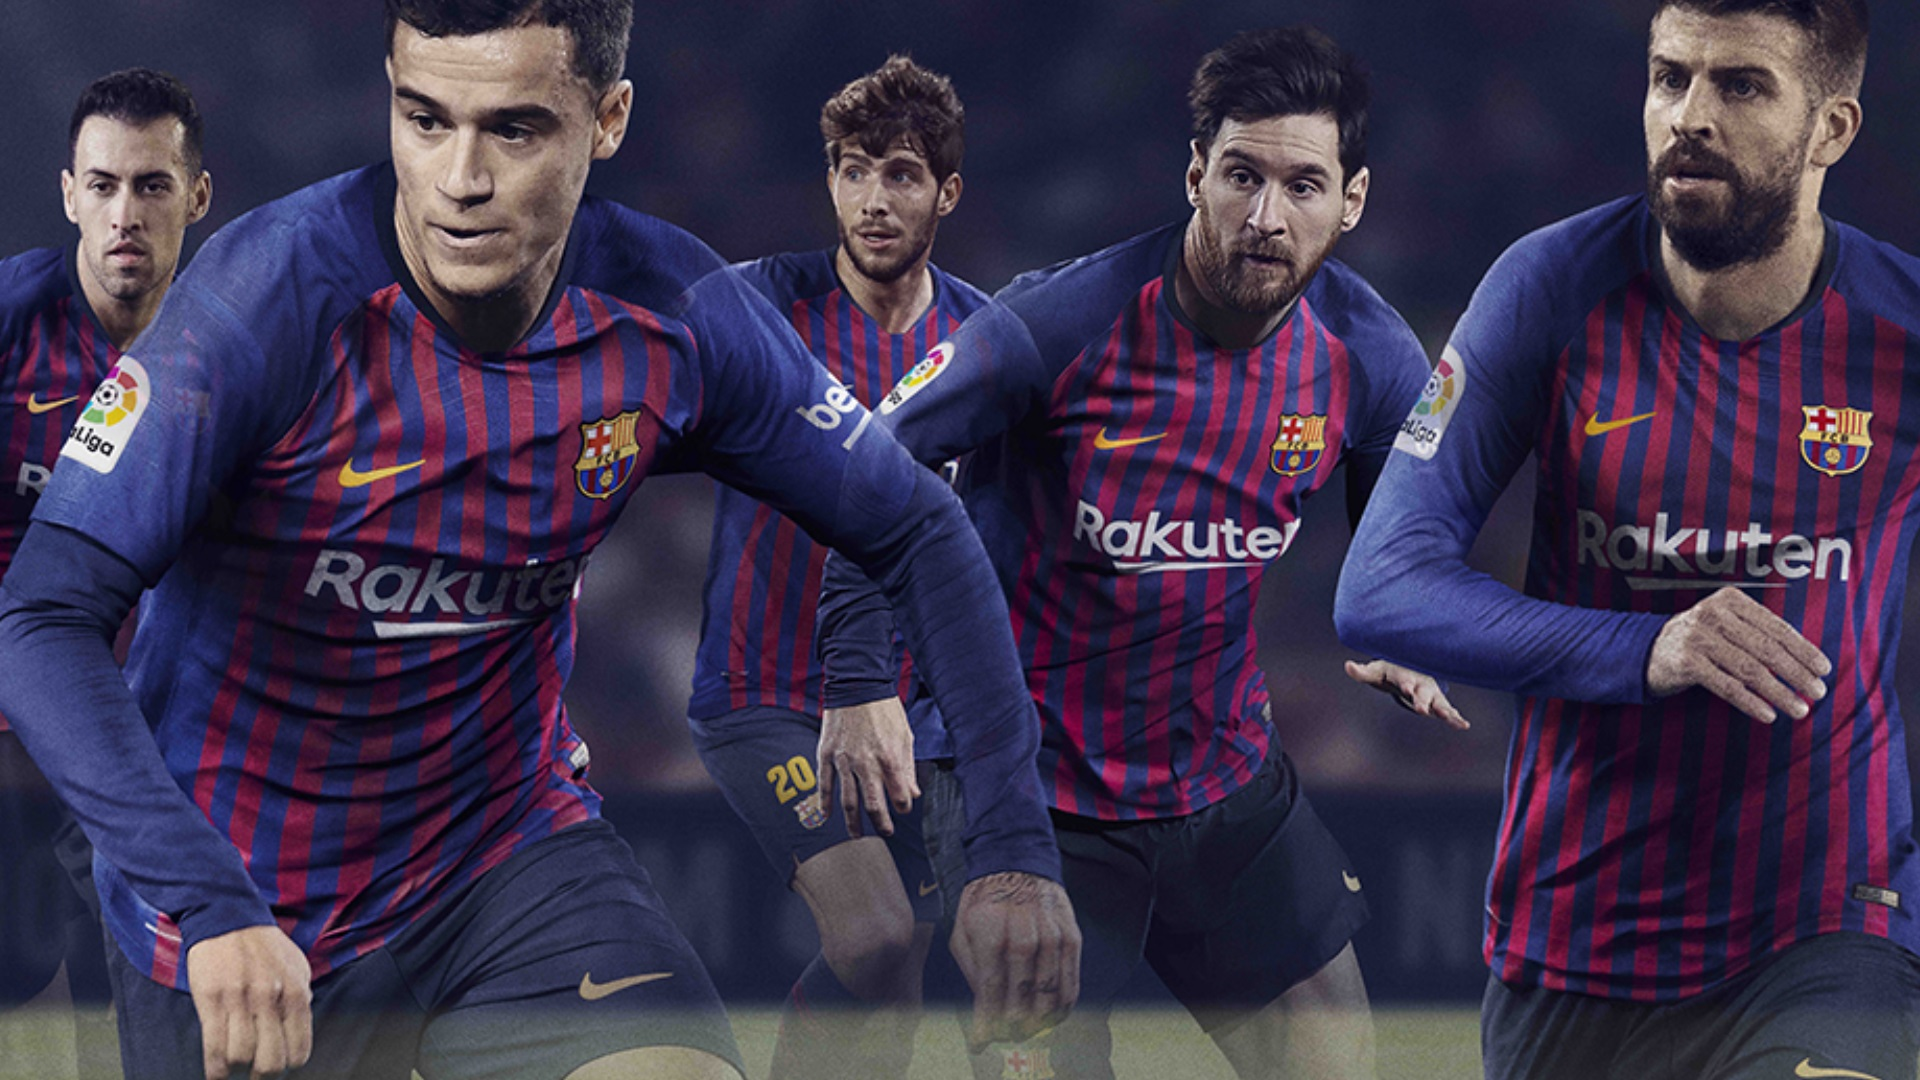 Barcelona  camisa 18-19 28 05 2018